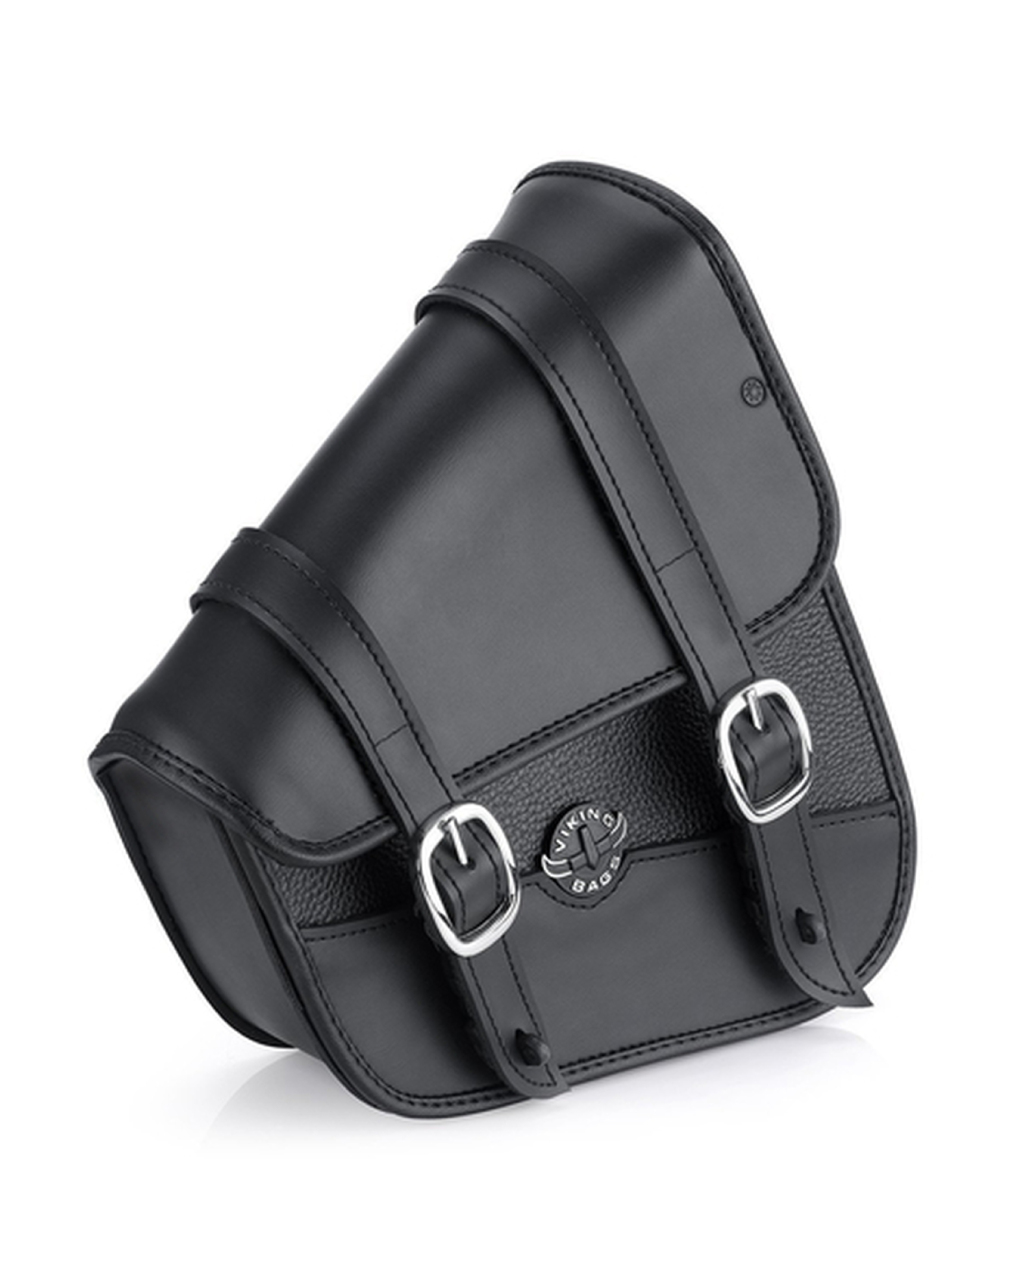 VikingBags Sportster Specific Motorcycle Swing Arm Bag Main Bag View